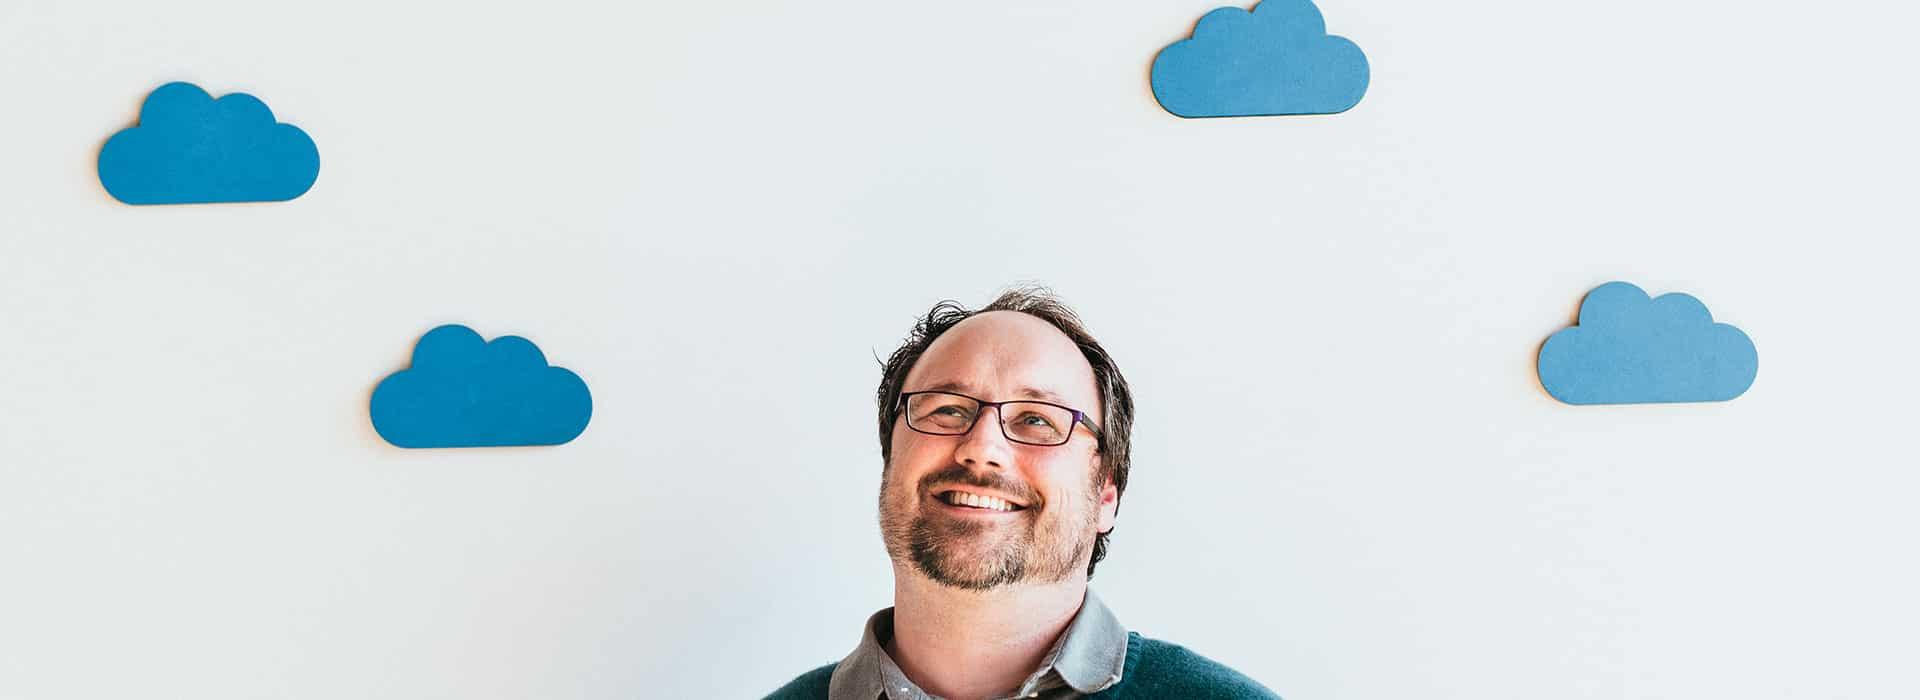 Curso de Cloud Computing